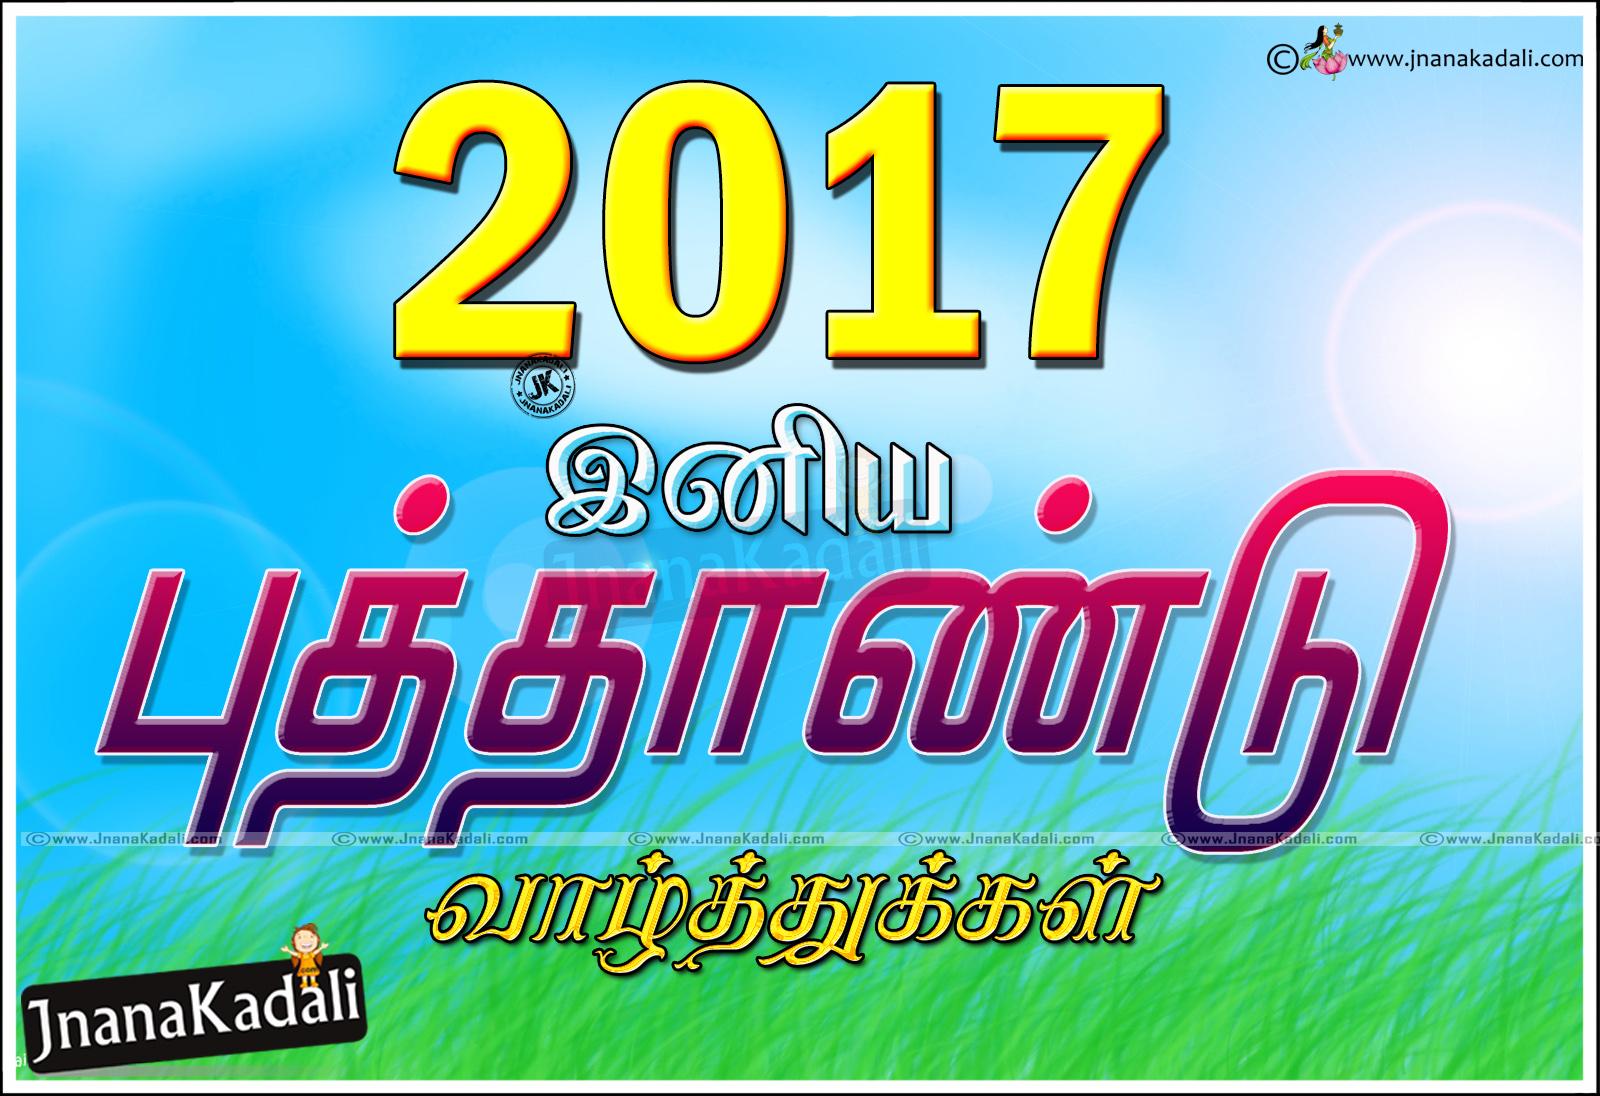 Tamil New Year 2017 Wishes Images Hd Wallsmiga